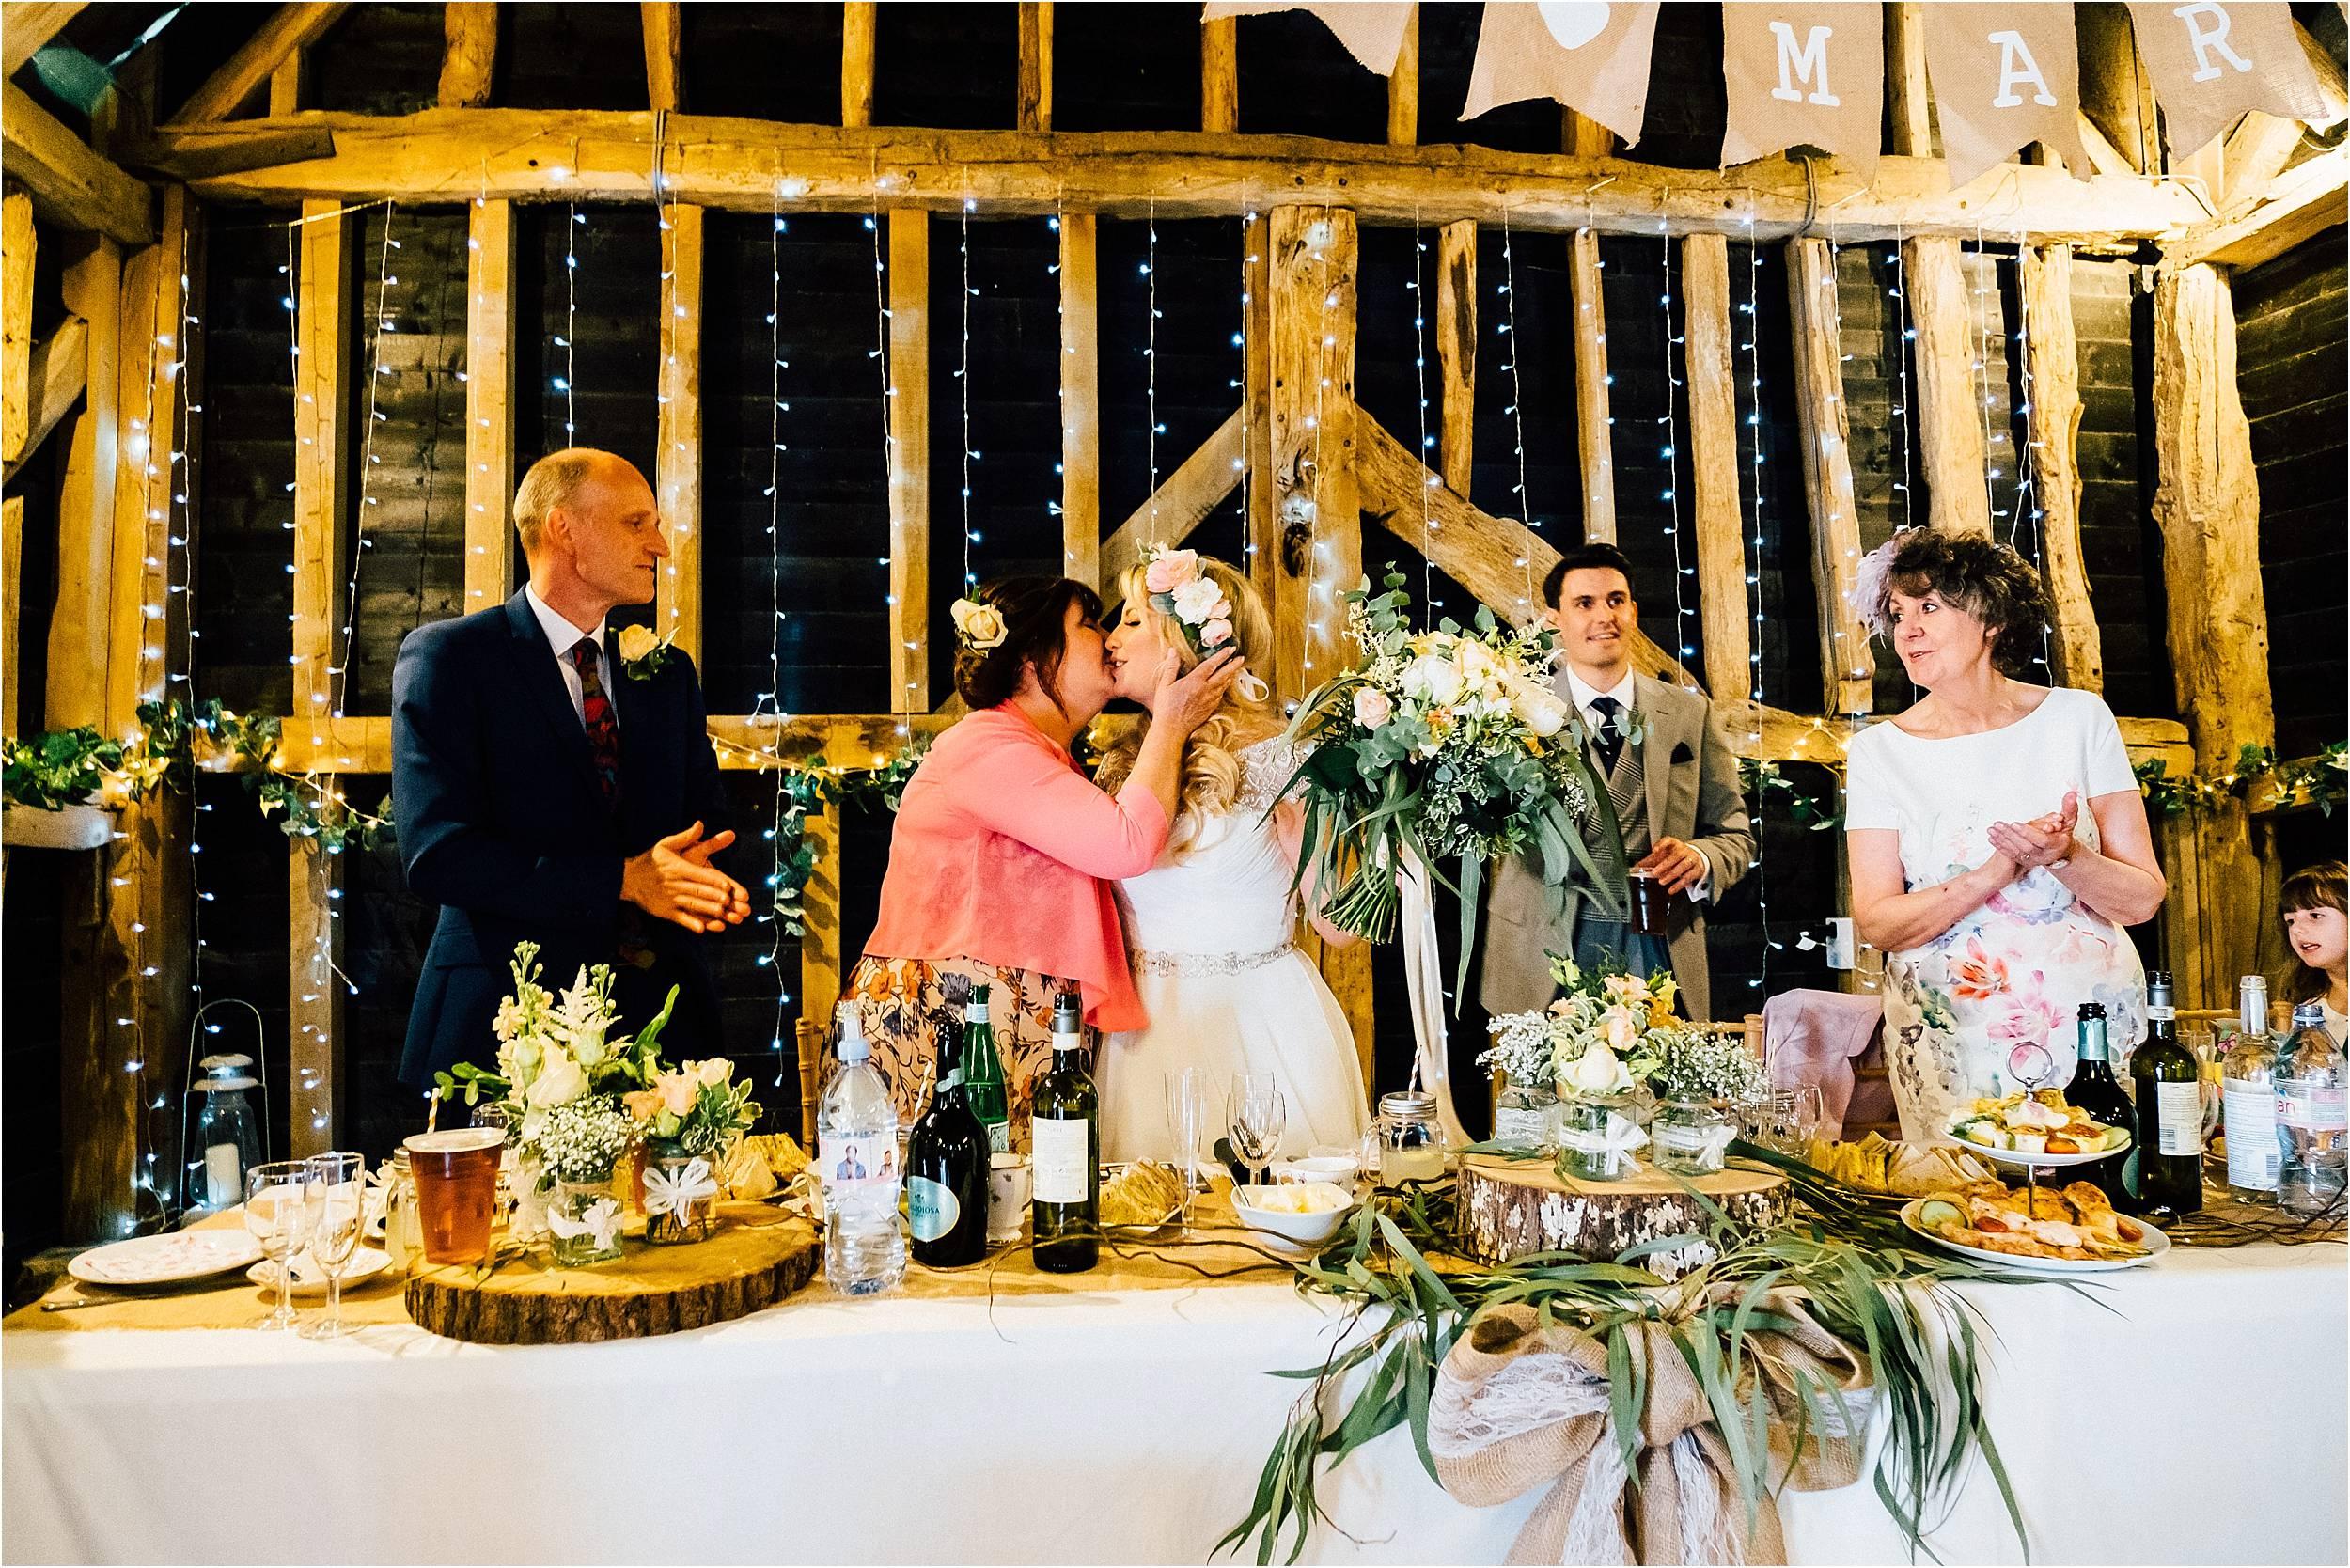 Surrey Hookhouse Farm Wedding Photographer_0125.jpg